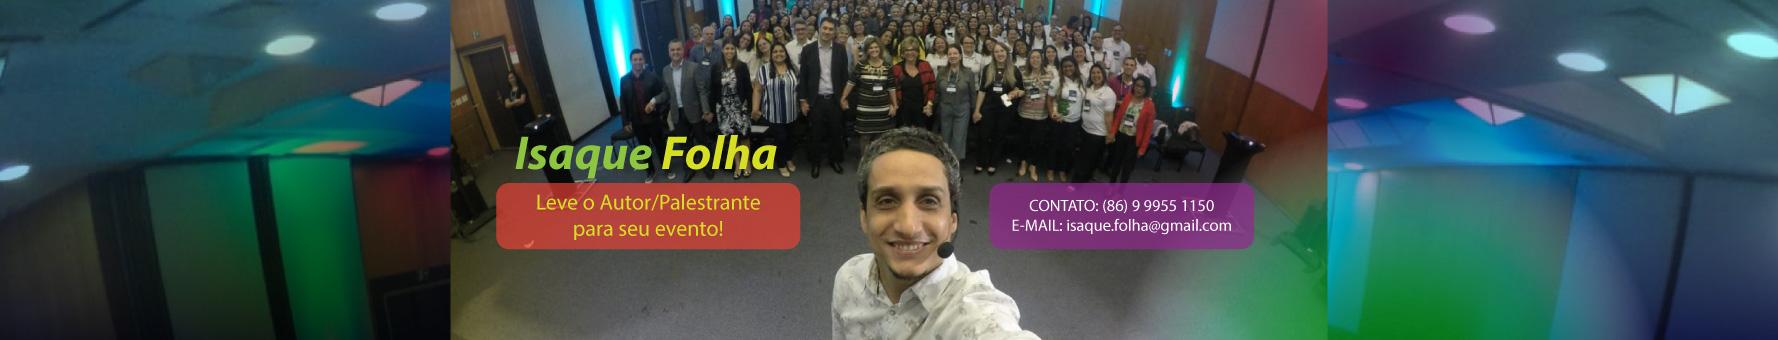 Isaque Folha